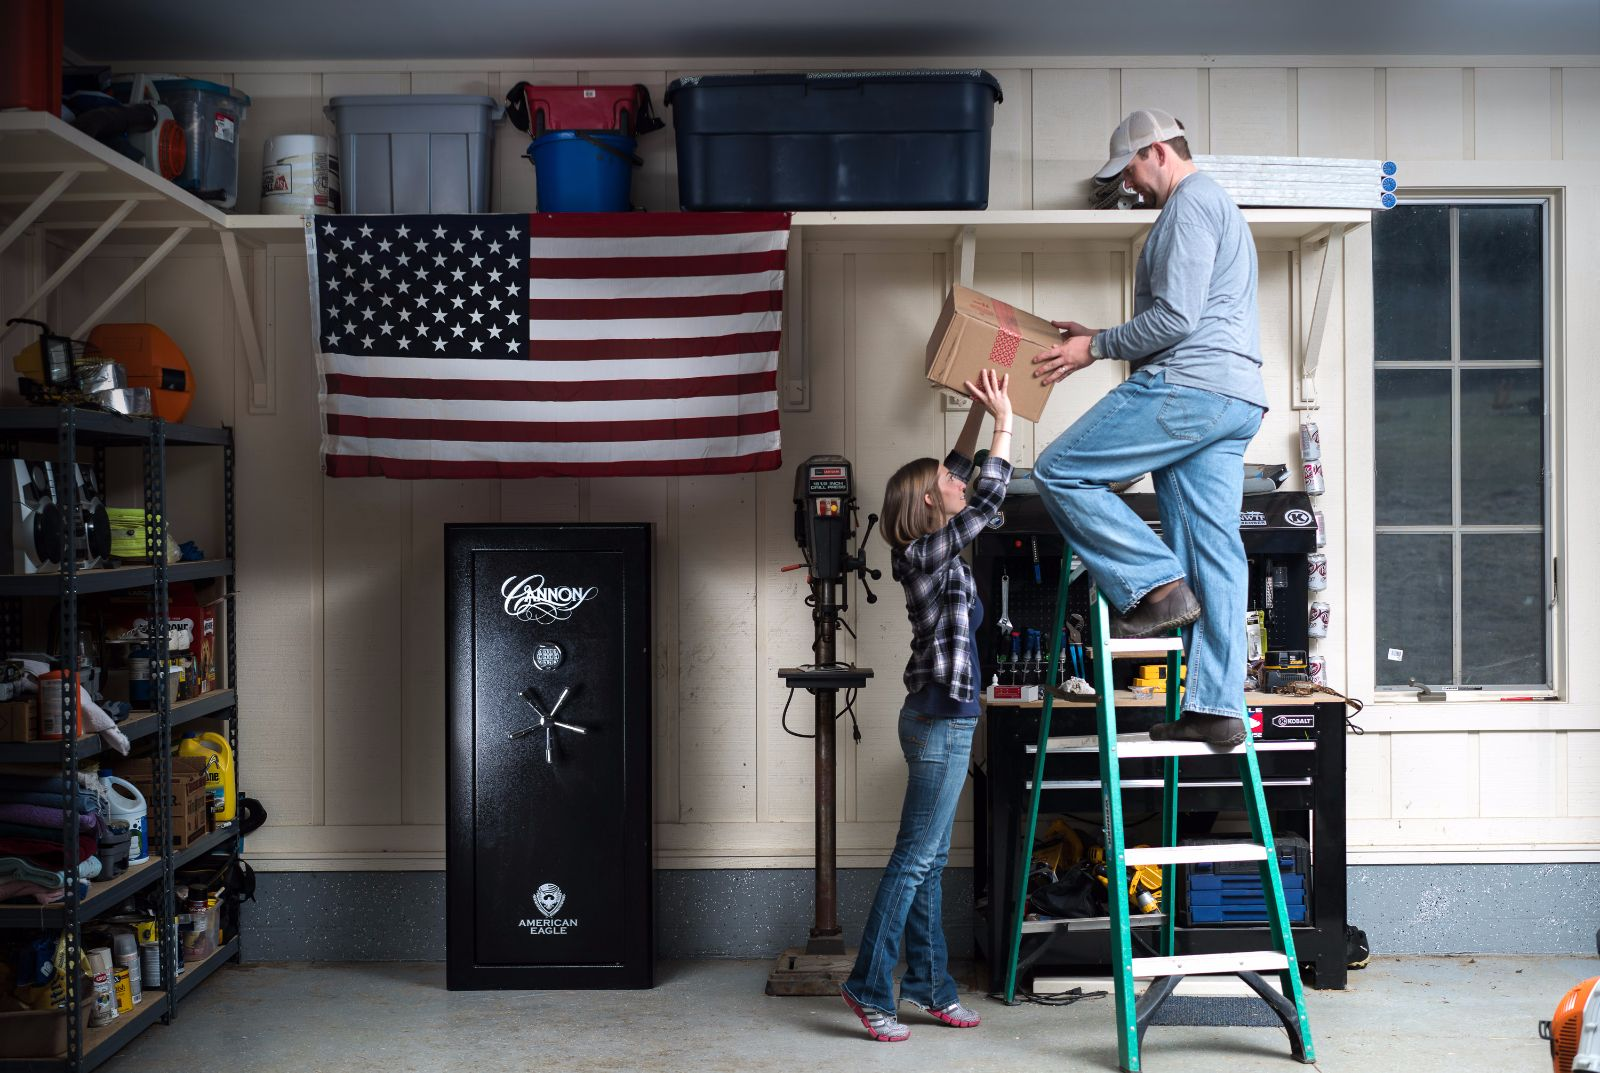 Where to keep gun safe the safest?